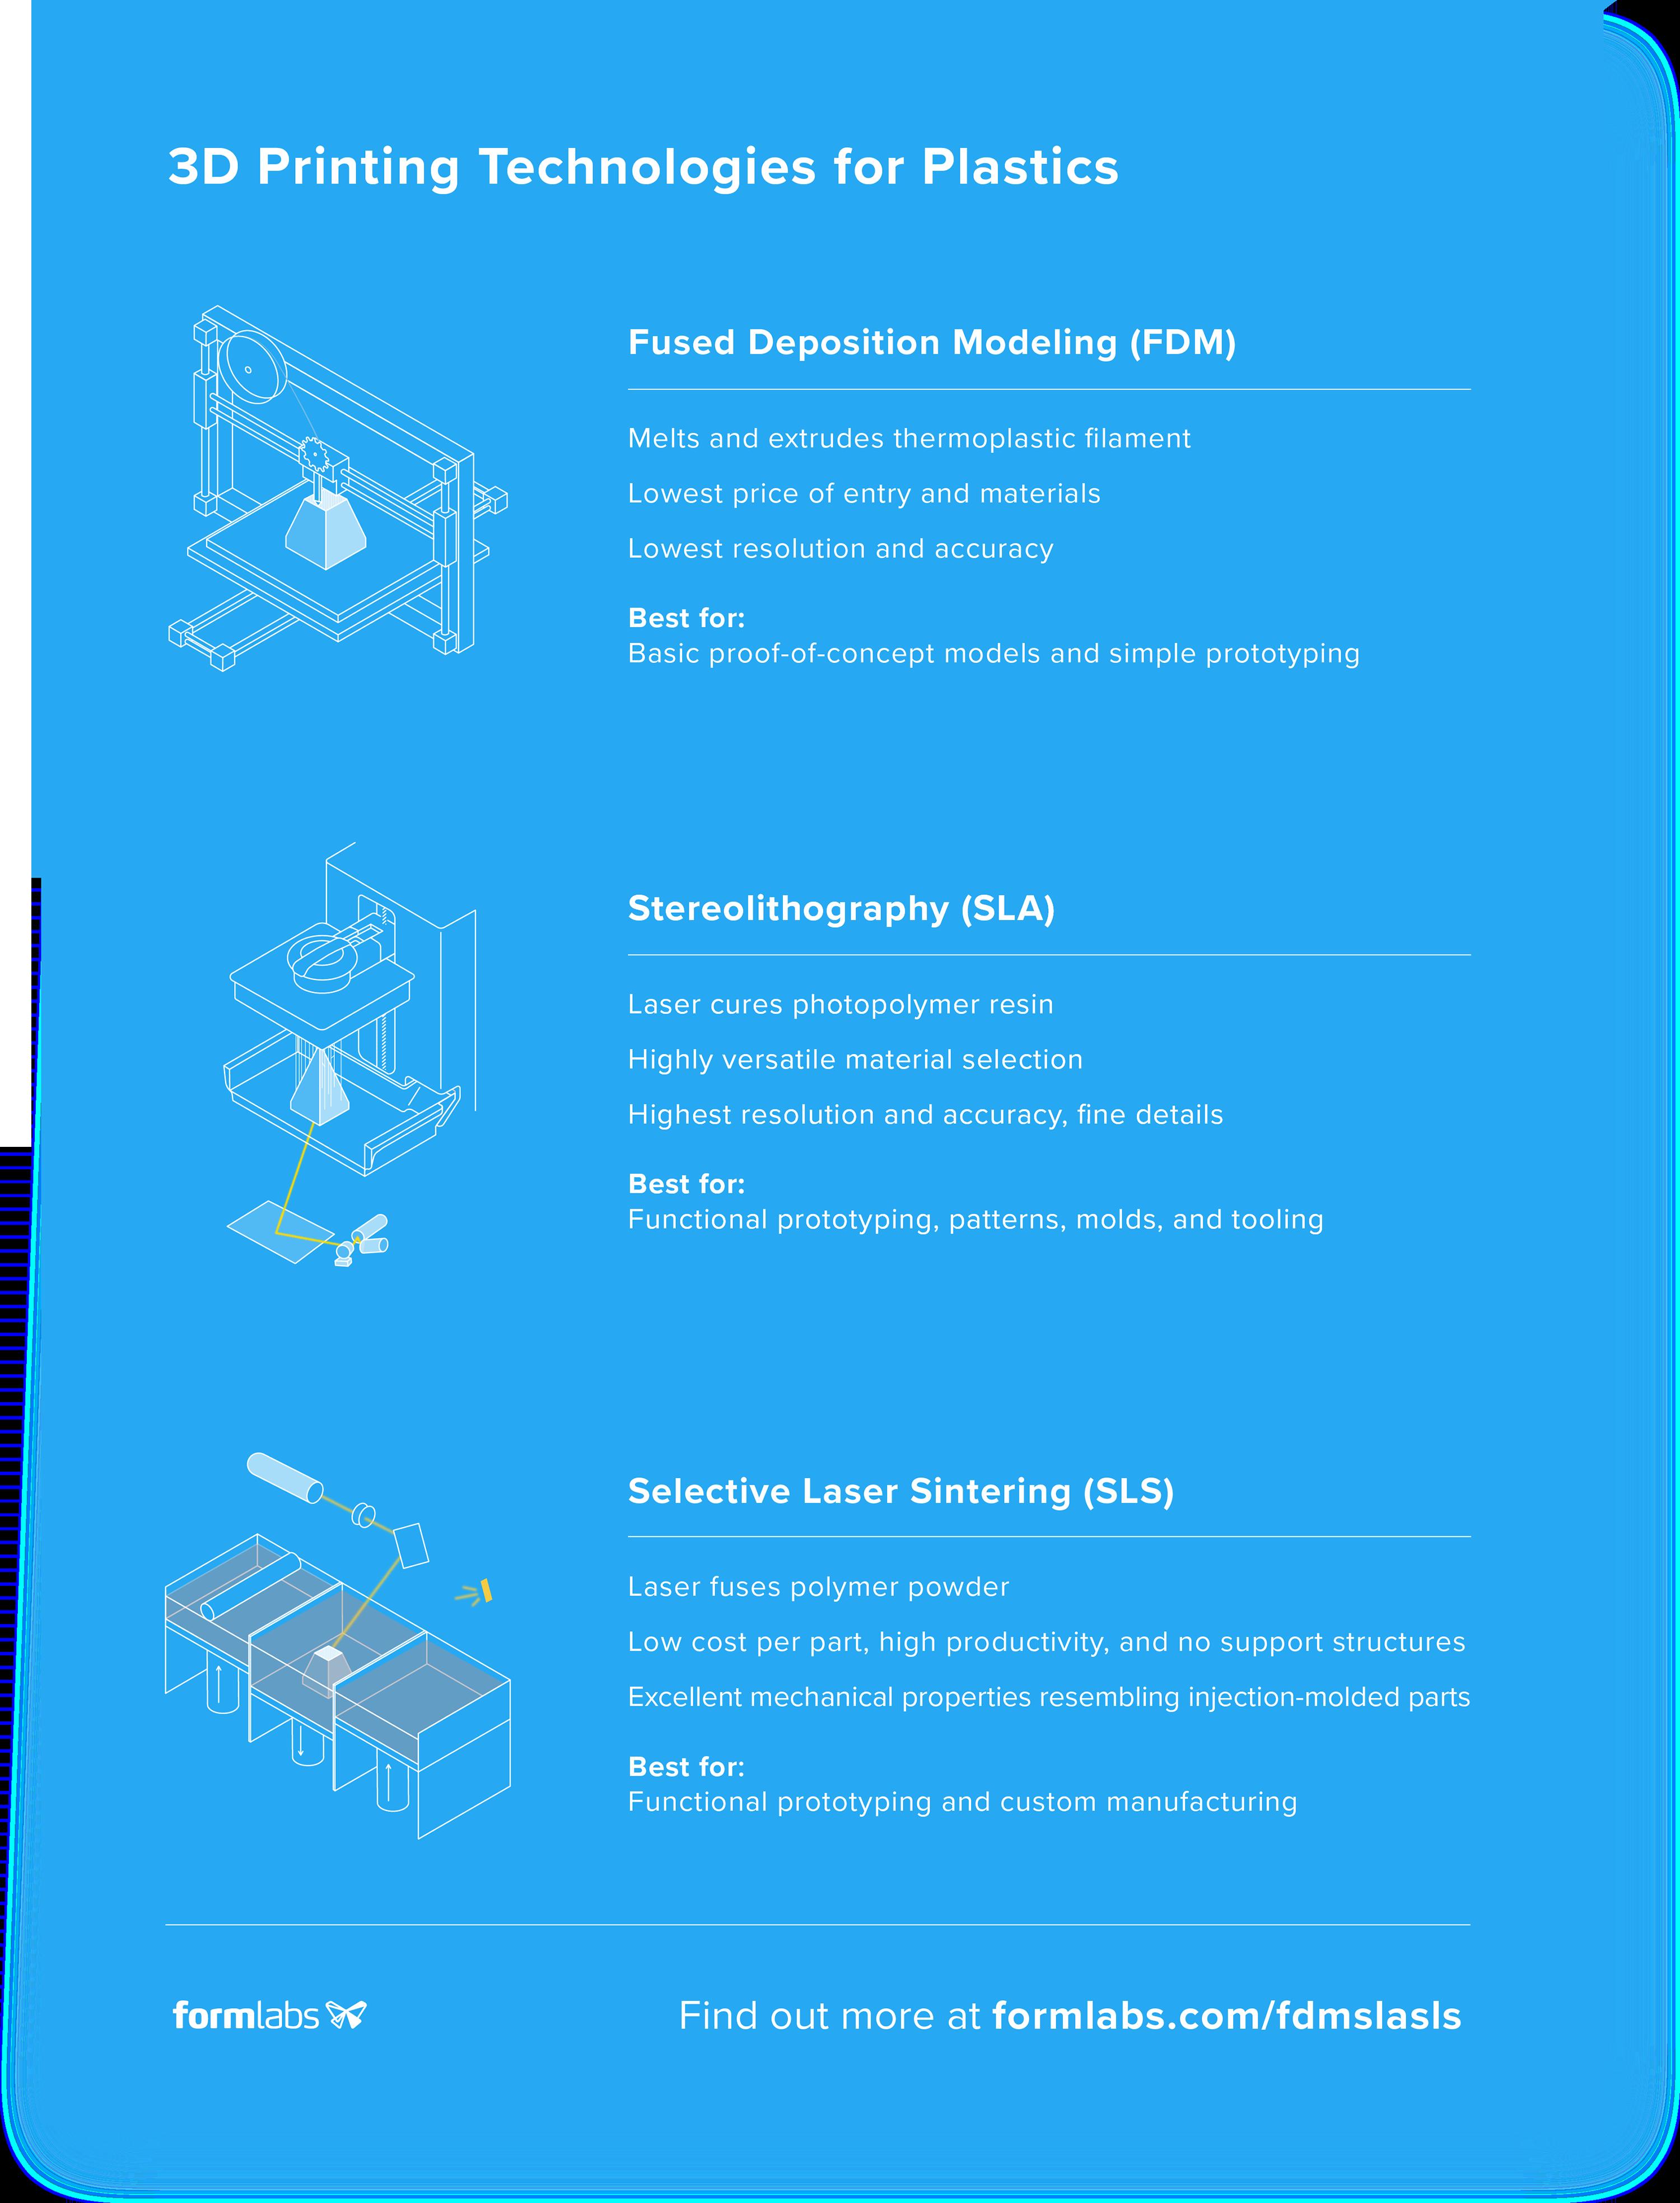 3D Printing Technology Comparison: FDM vs  SLA vs  SLS | Formlabs